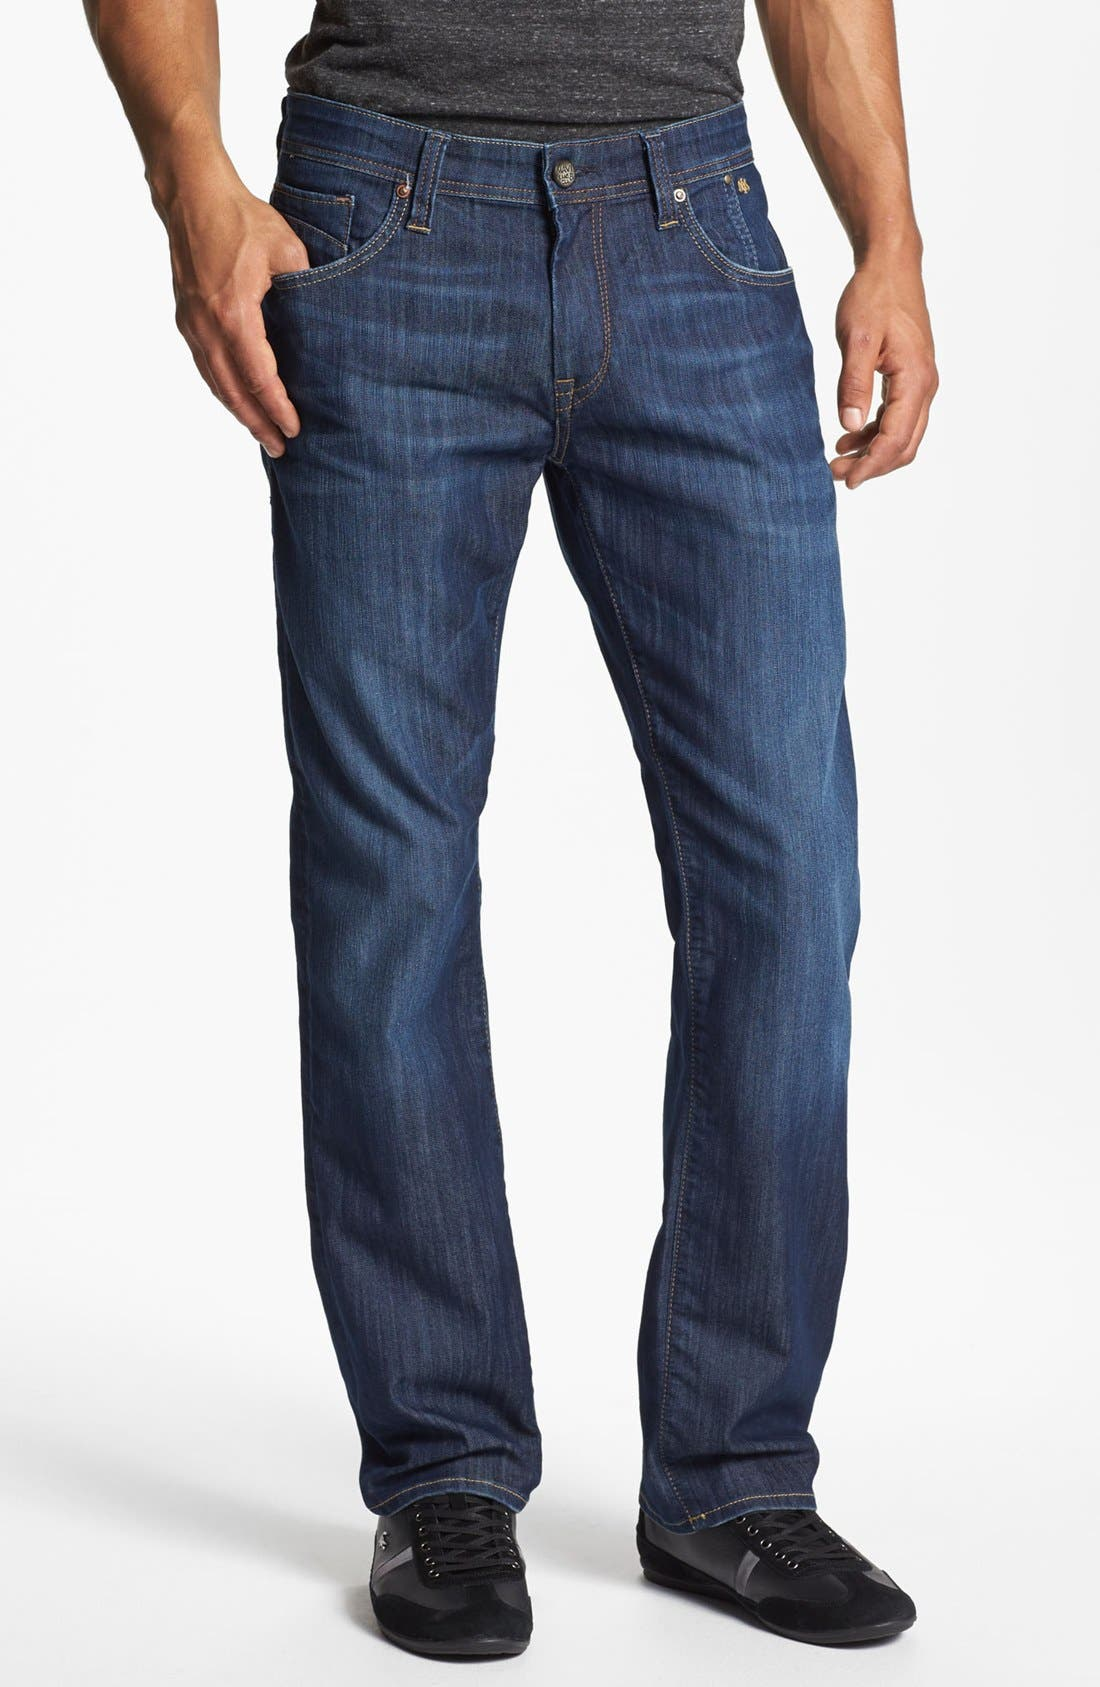 Alternate Image 1 Selected - Mavi Jeans 'Zach' Straight Leg Jeans (Dark Maui) (Online Only)